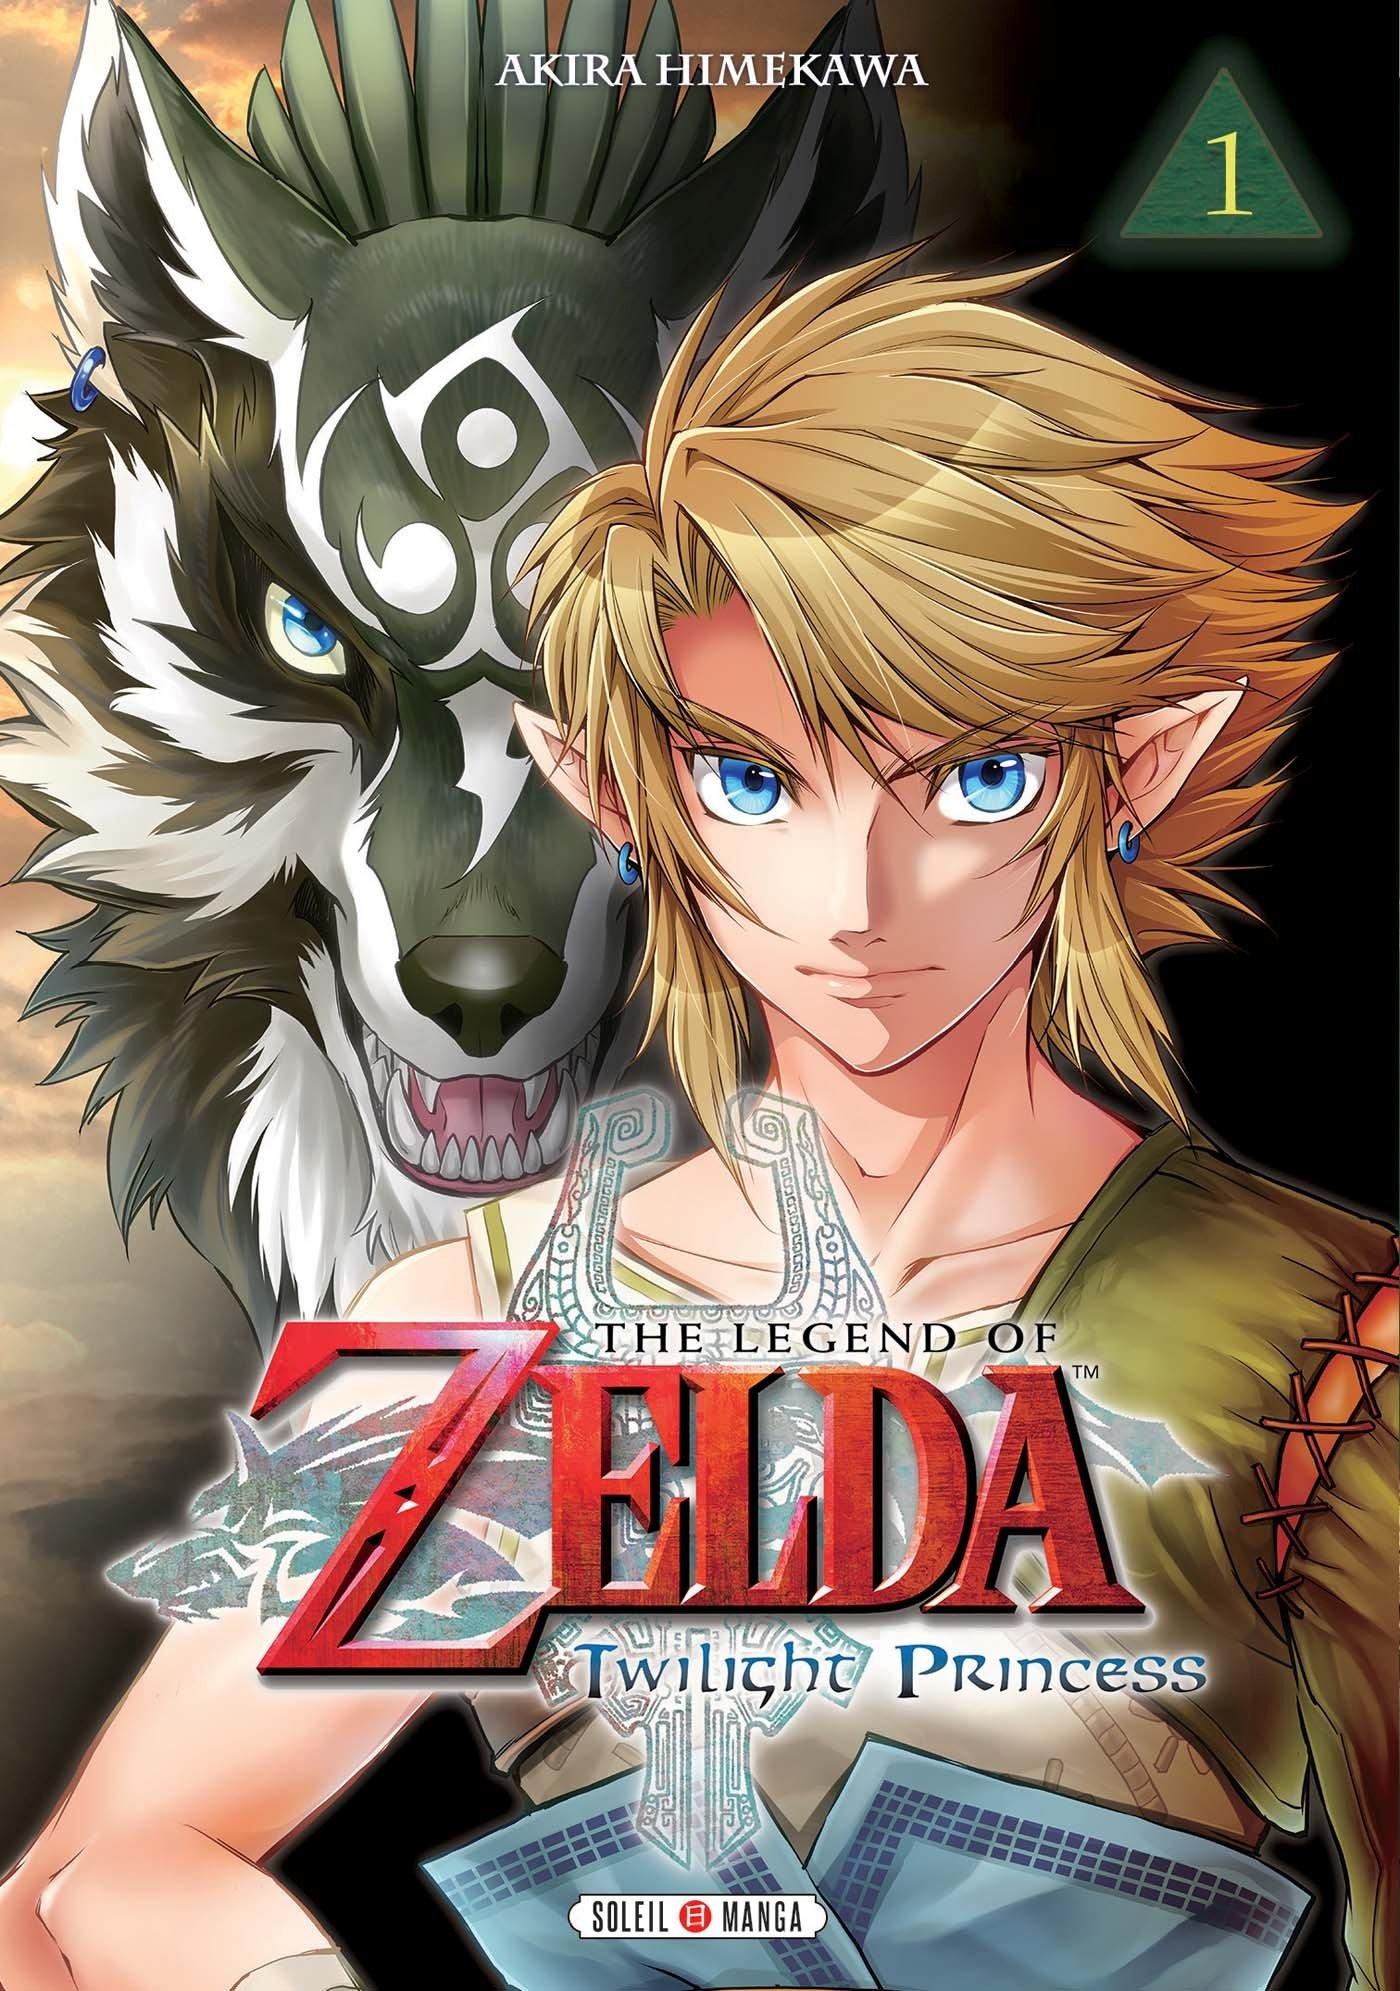 zelda-twilight-princesse-1-soleil-manga.